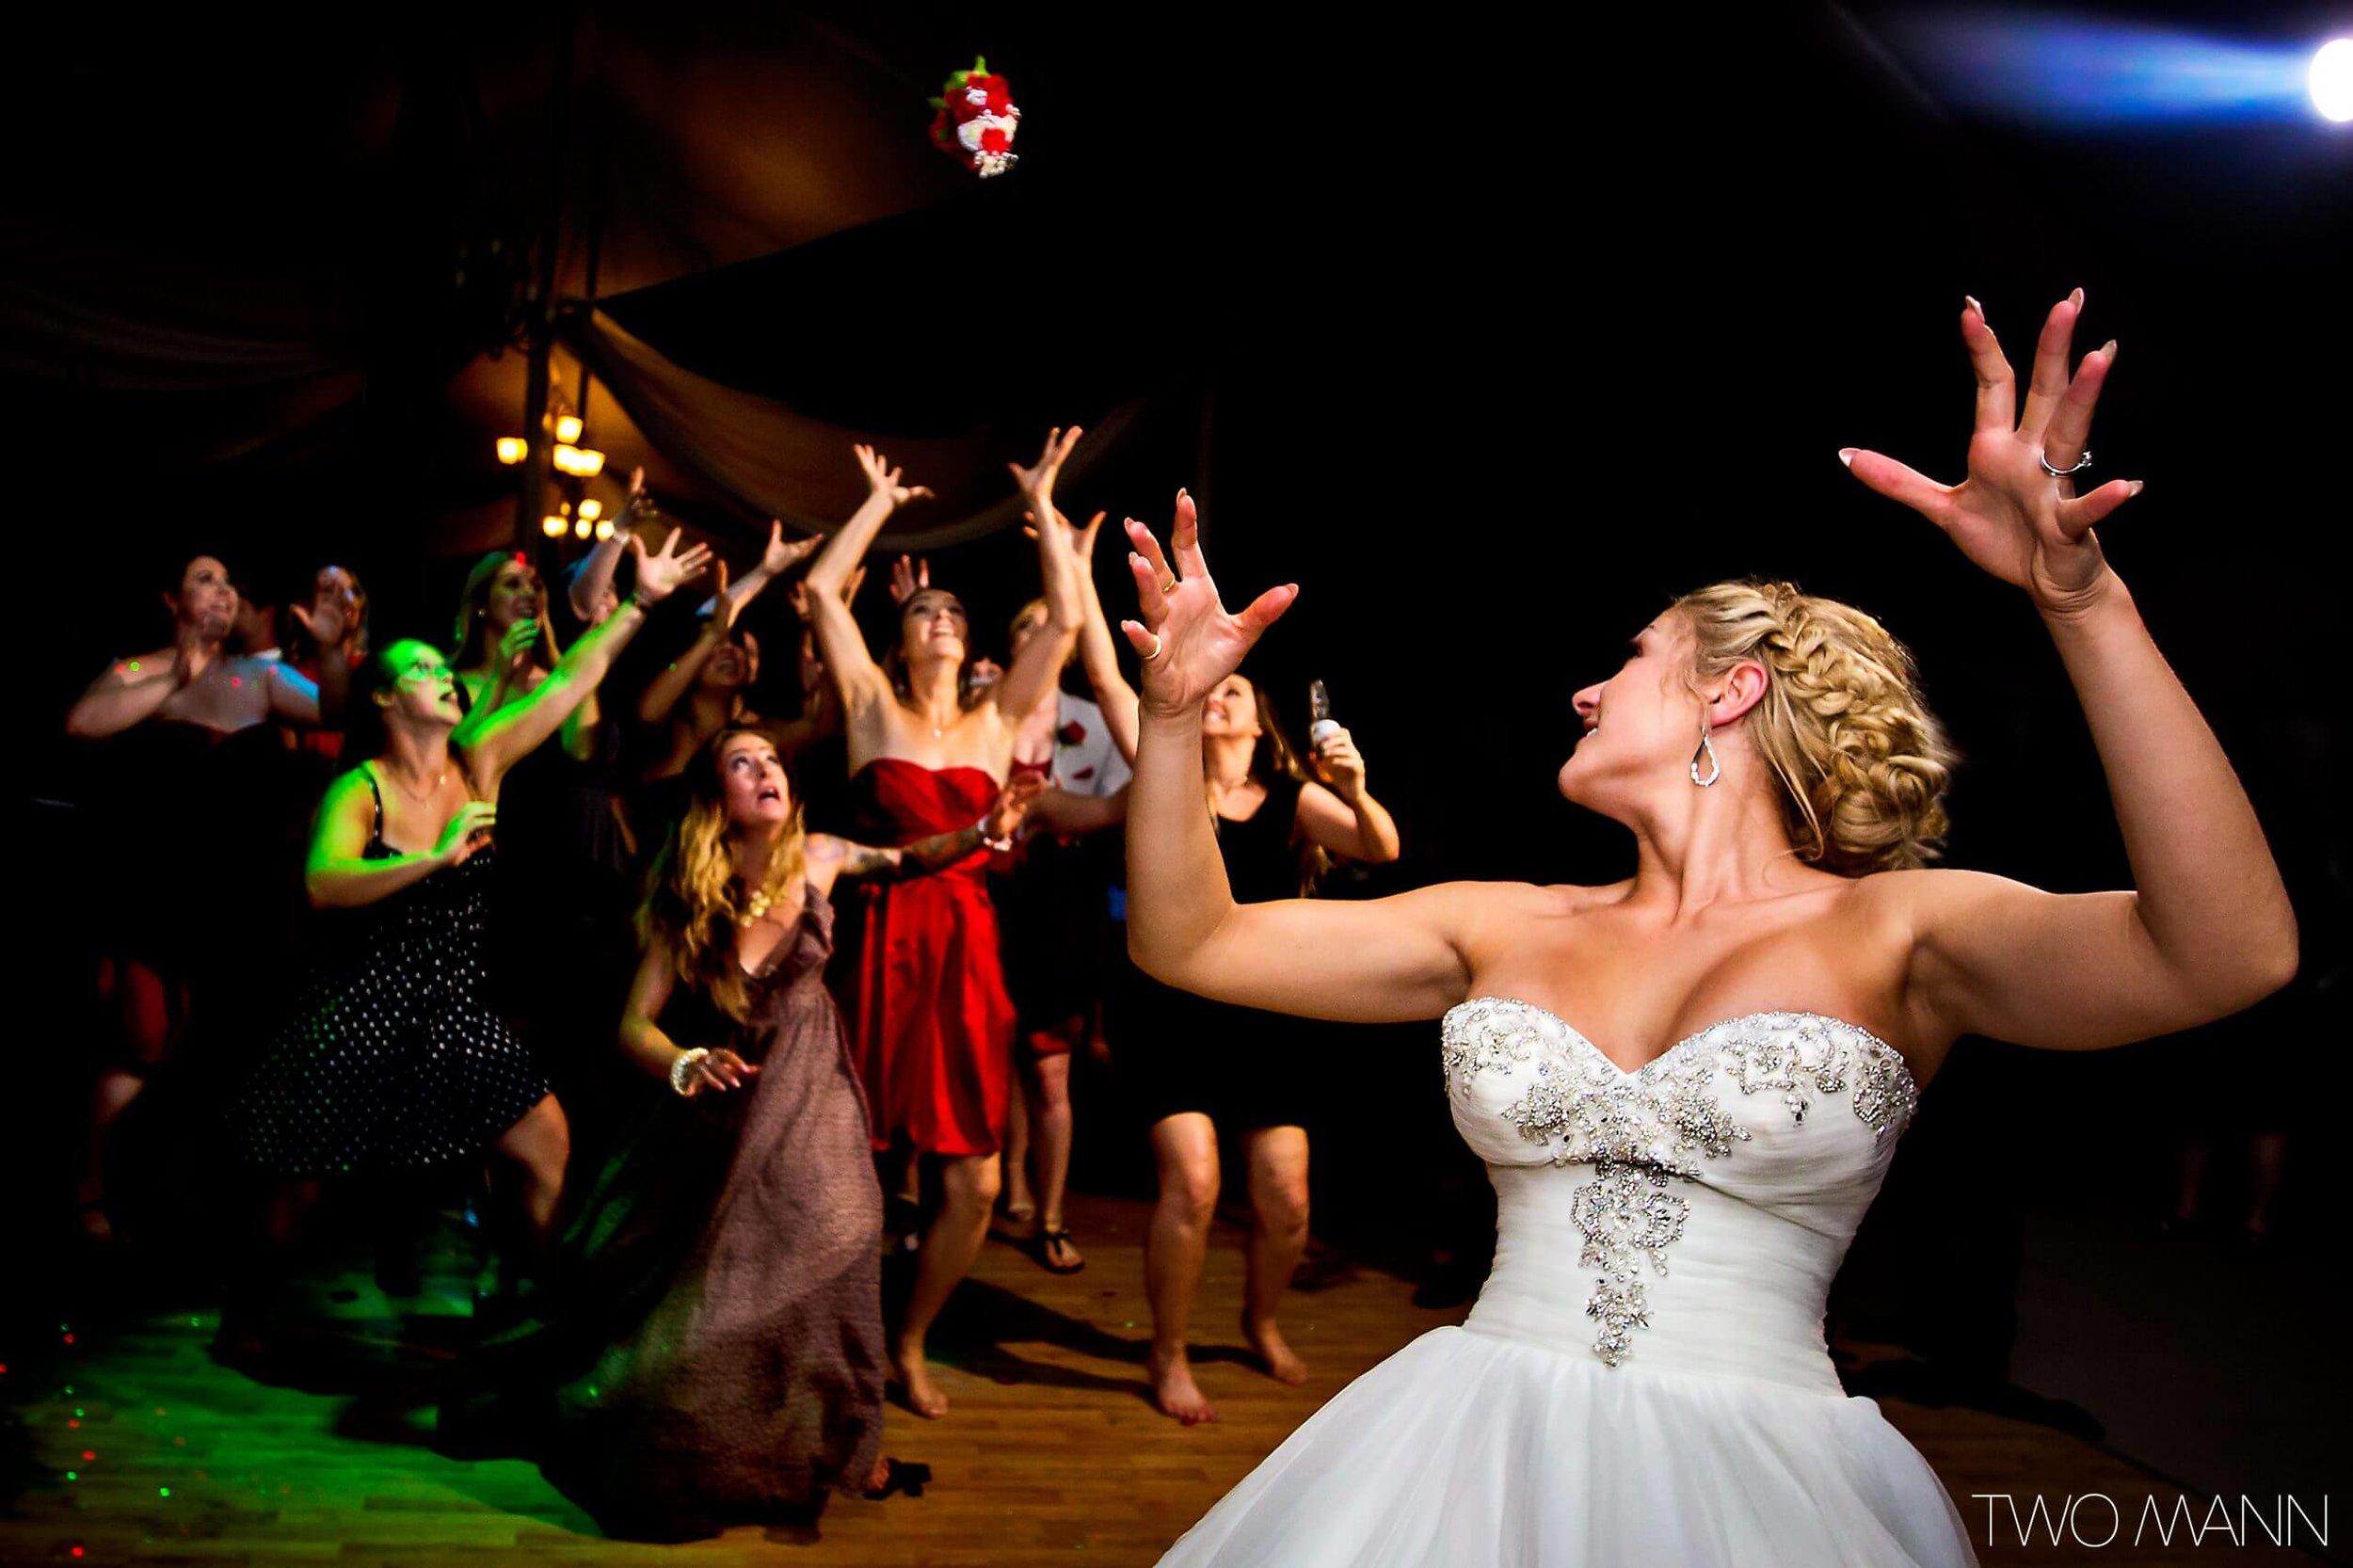 Two-Mann-Studios-Worlds-Best-Wedding-Photography-Best-of-2016-060-2560x1706.jpg